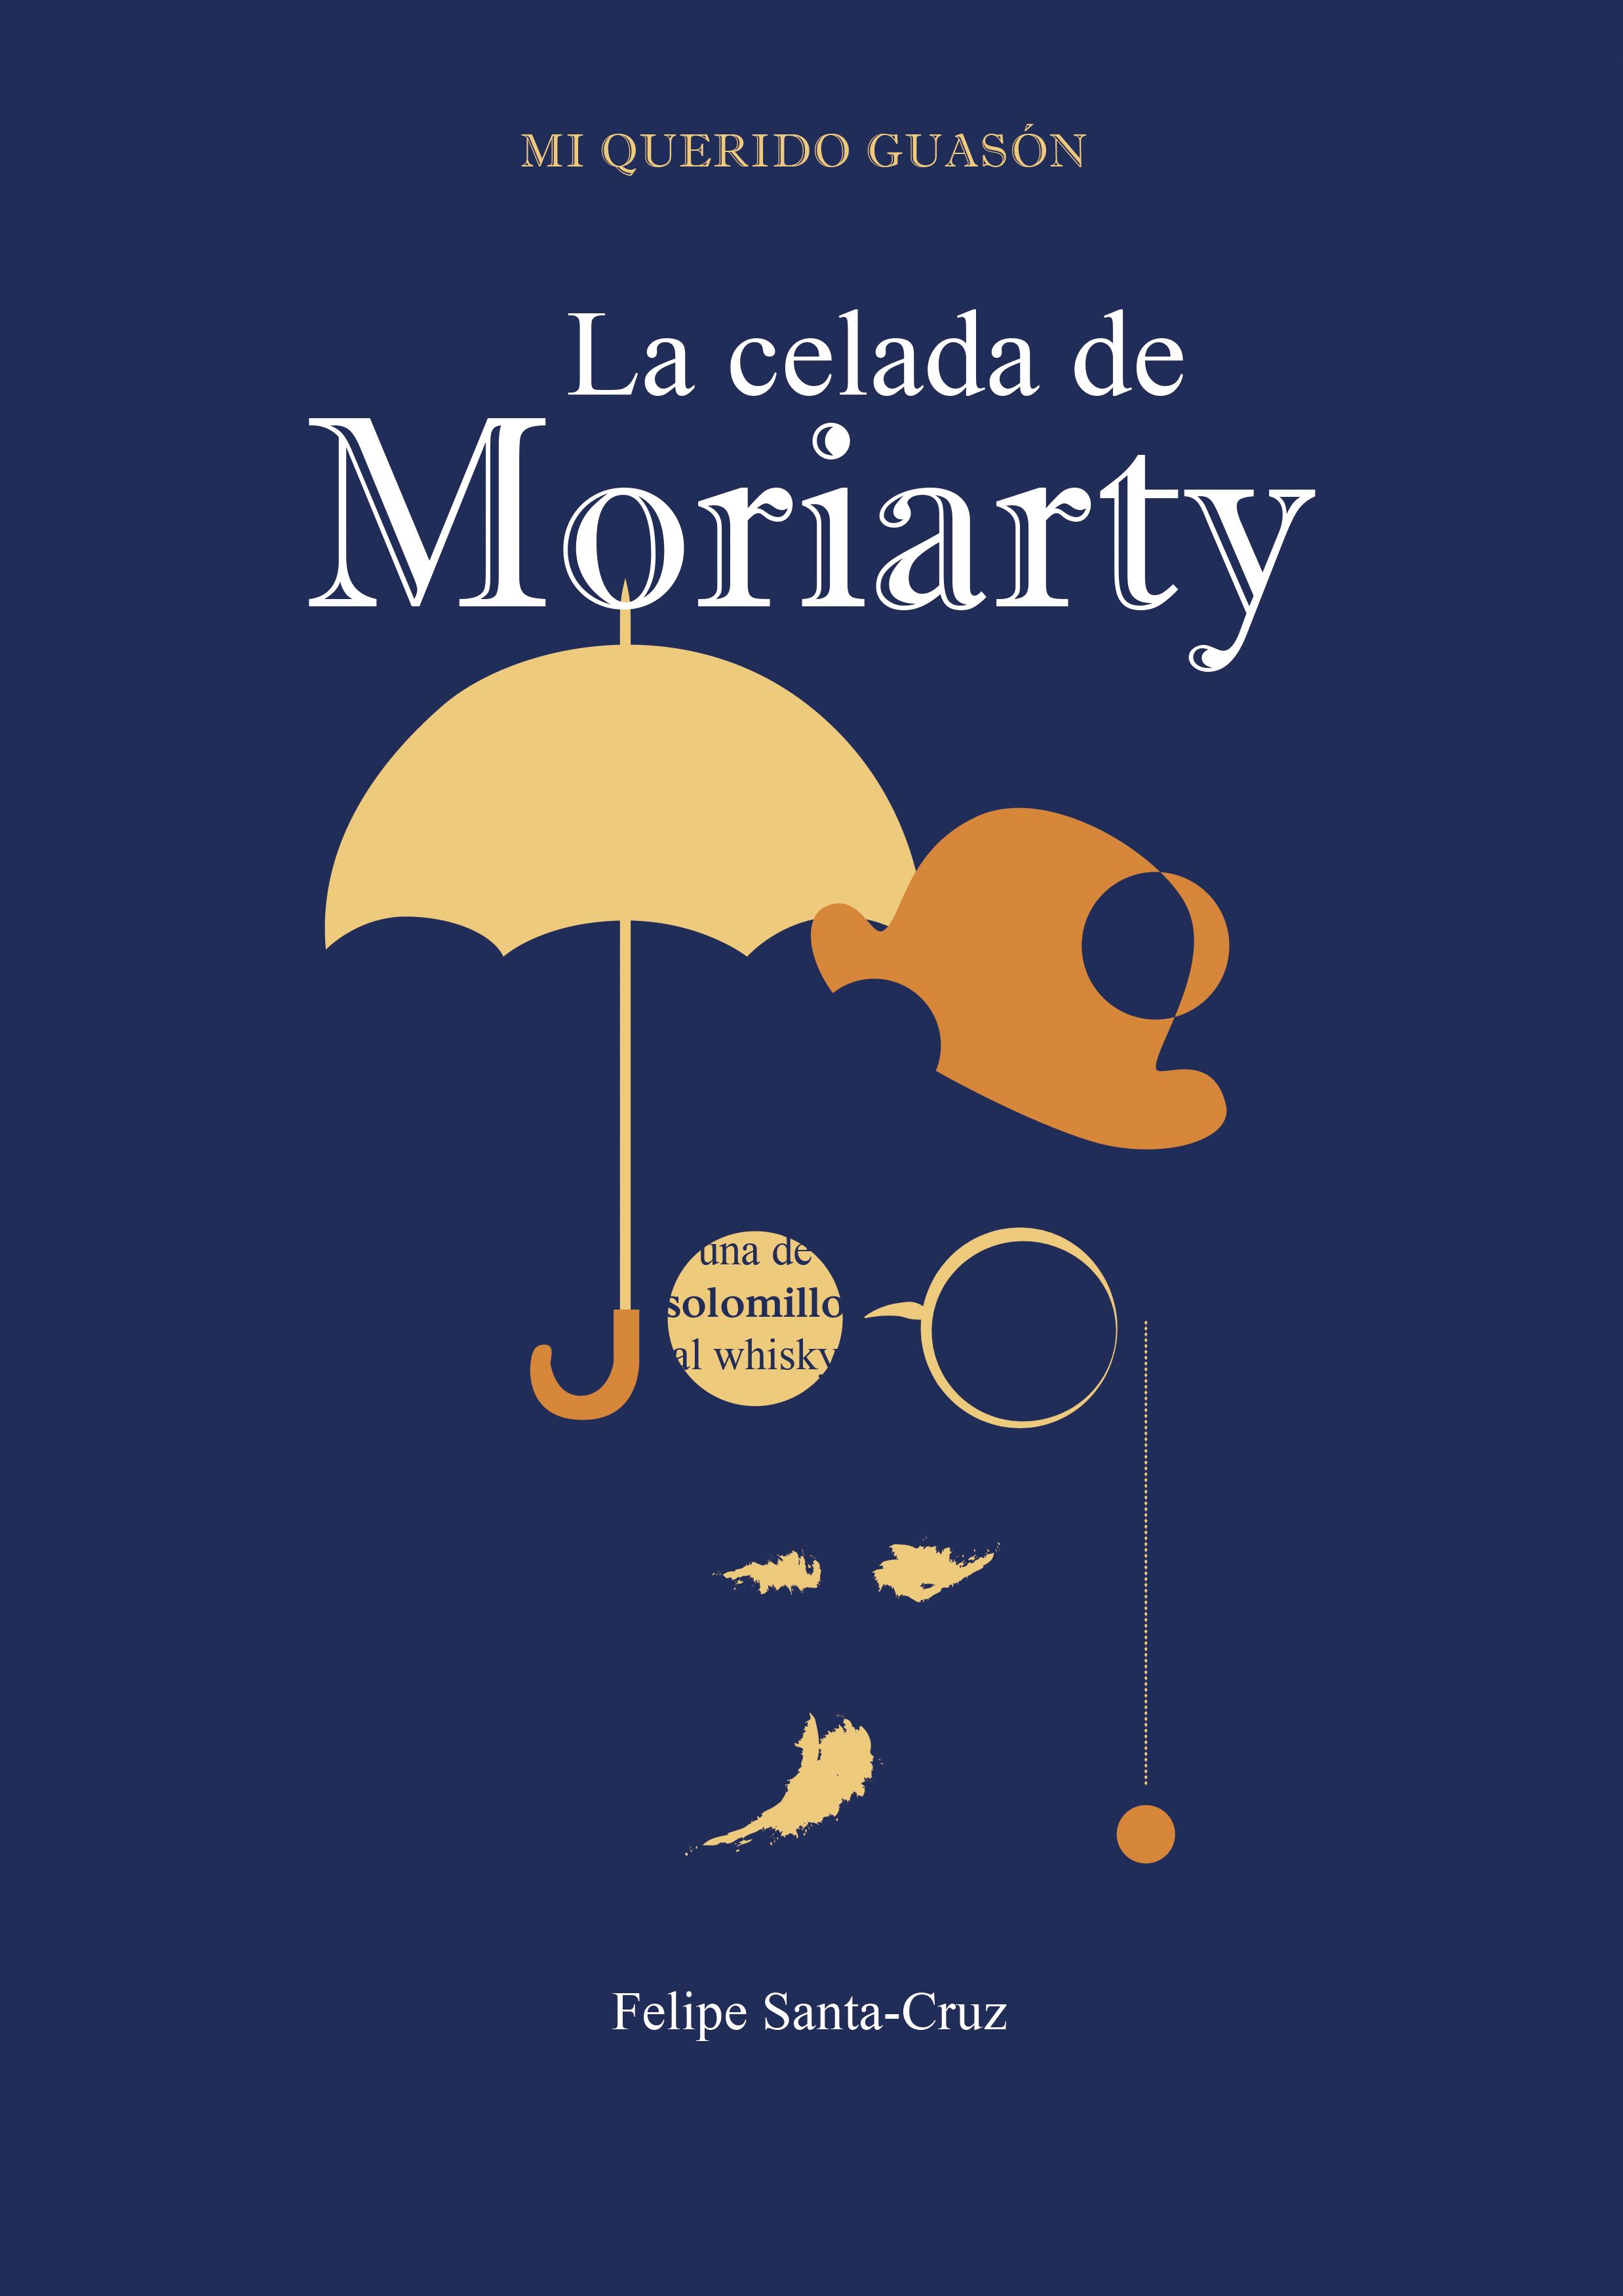 La celada de Moriarty